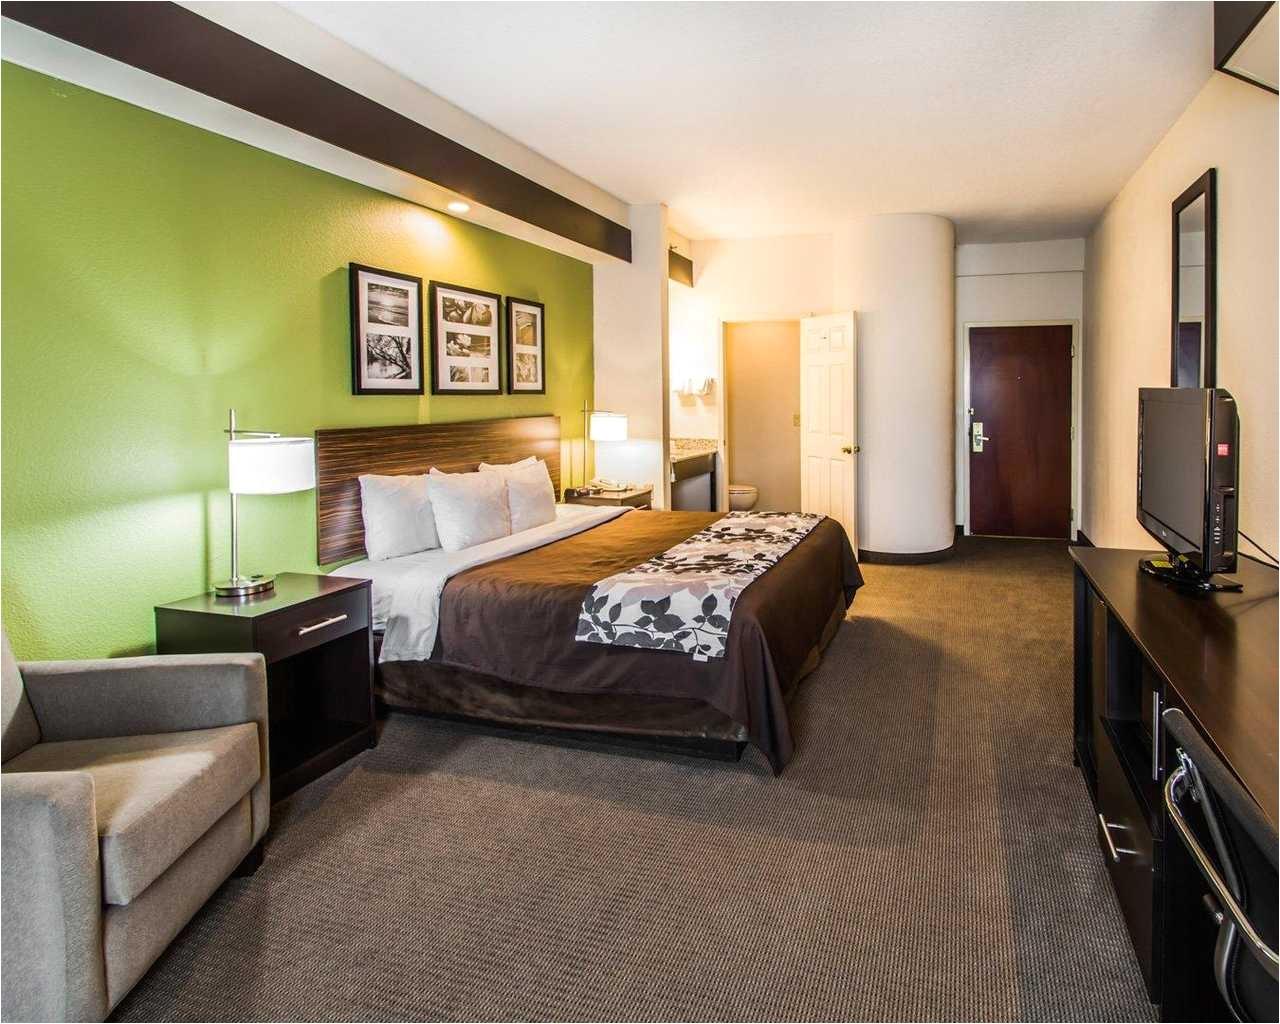 2 Bedroom Hotels In orlando Near Universal Sleep Inn orlando Airport Fl Near by Seaworld islands Of Adventure